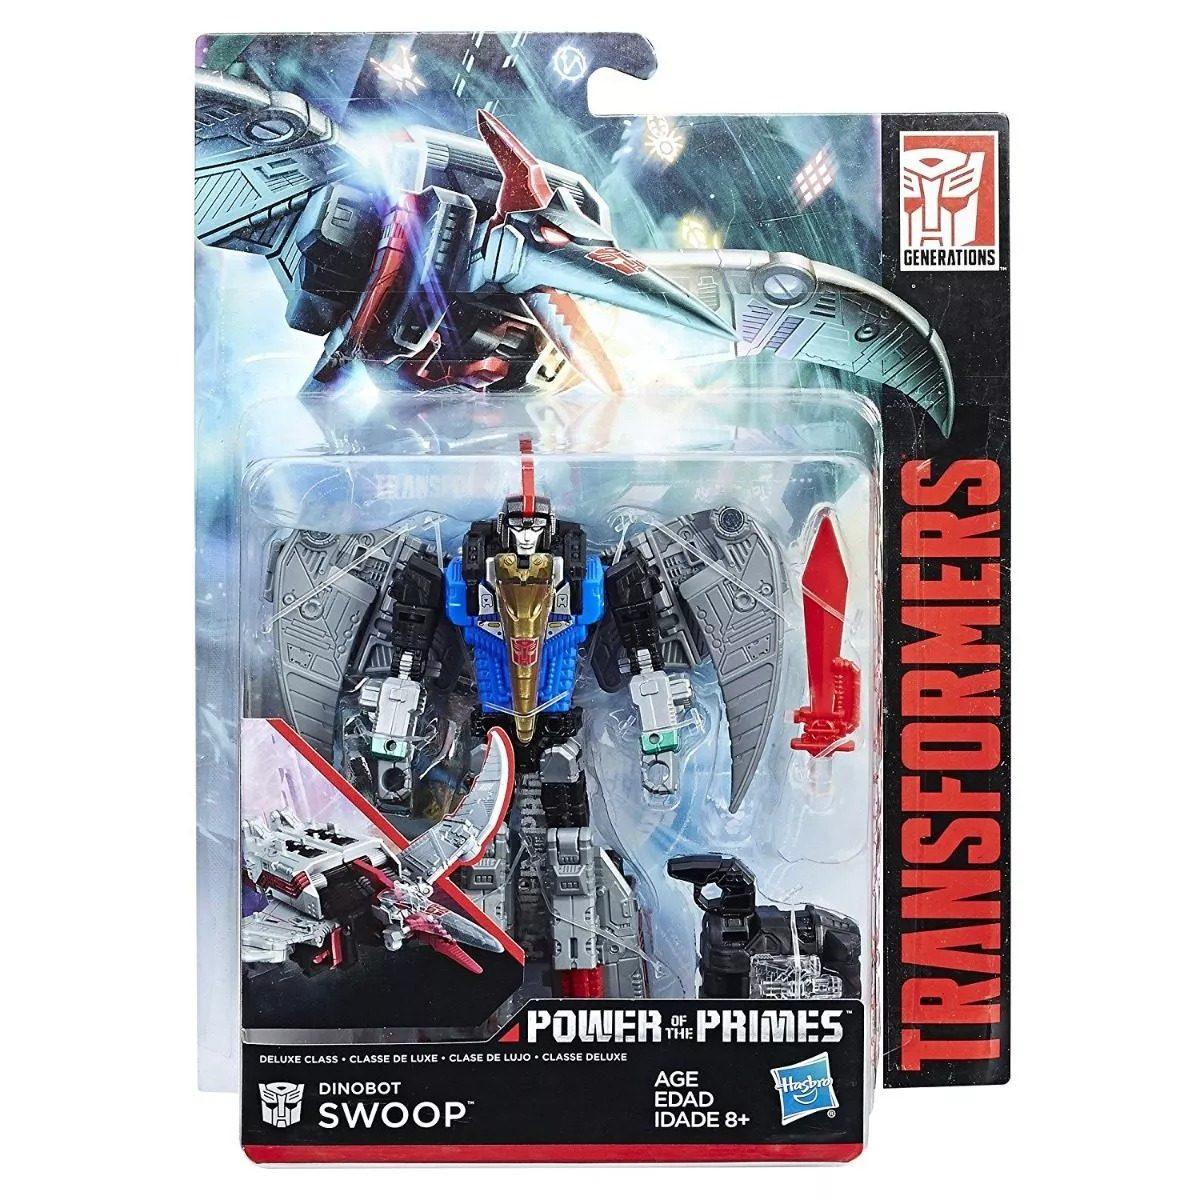 Generations Power of the Primes Deluxe Dinobot Swoop New in Box 14cm